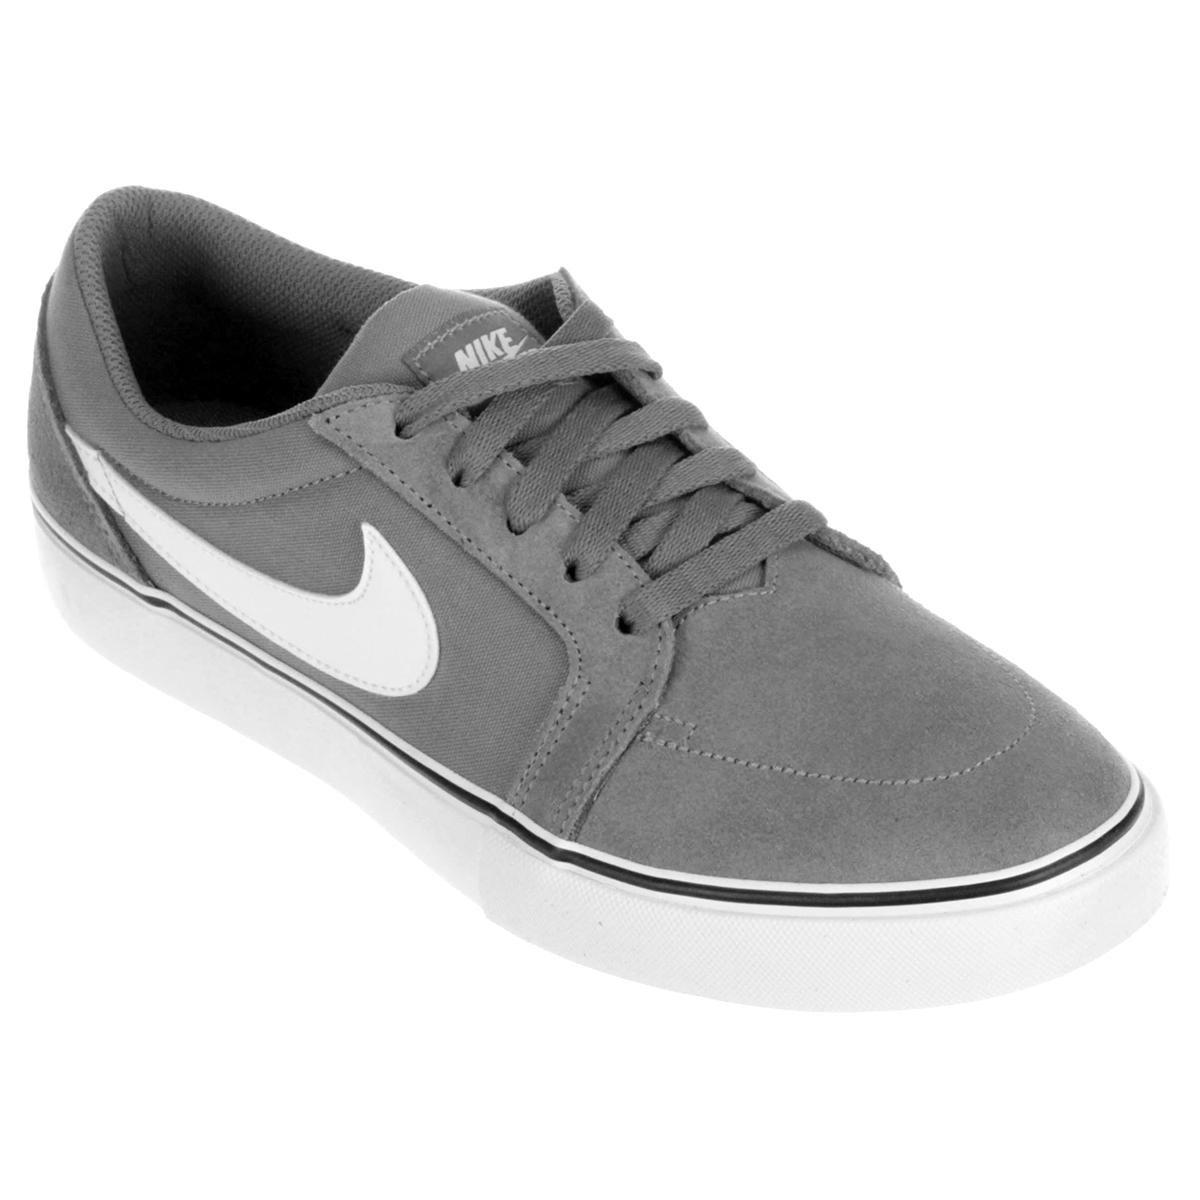 fc0f70fe510 Tênis Nike Sb Satire Ii - Compre Agora